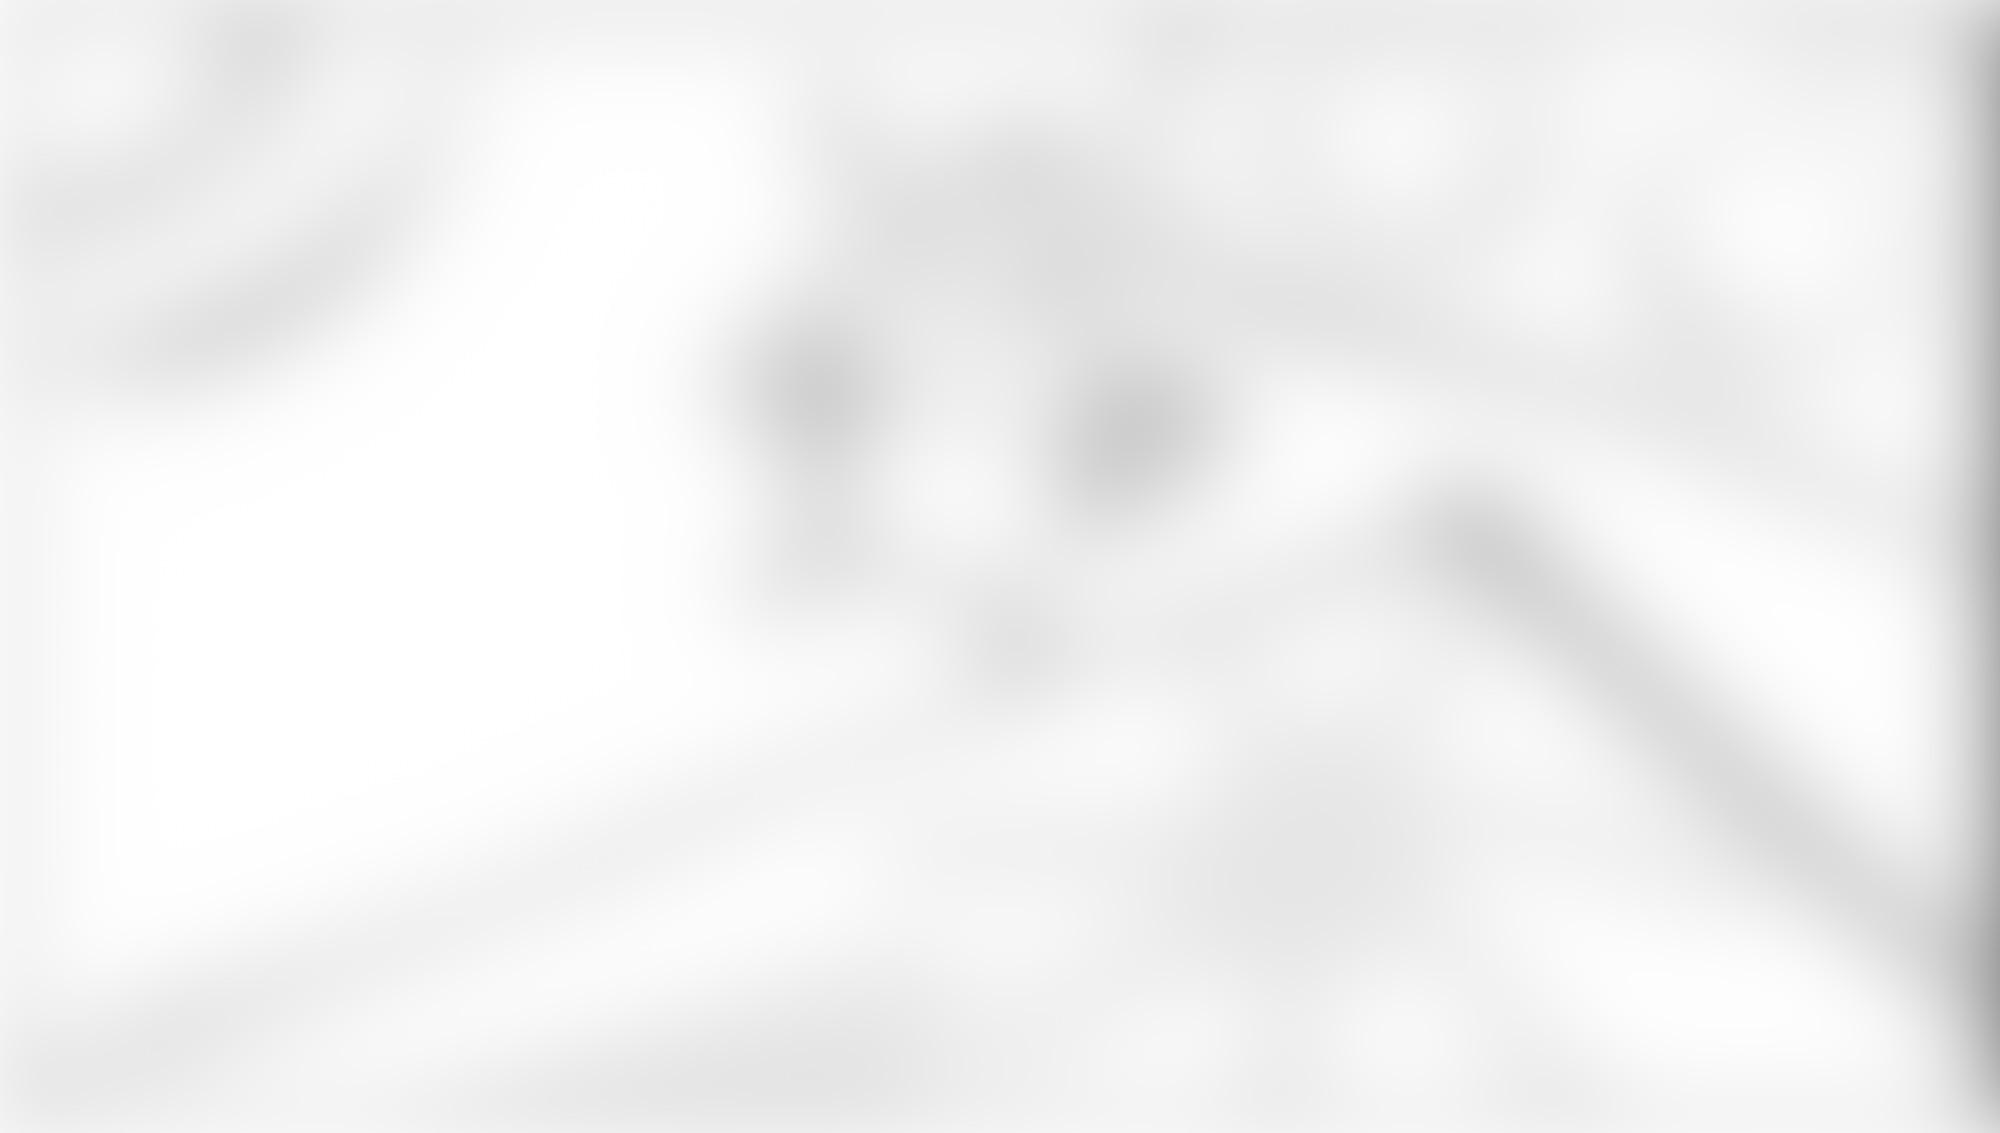 Floo9 autocompressfitresizeixlibphp 1 1 0max h2000max w3 D2000q80s05e8decdbe4cfd04b38e688bb5fd3229